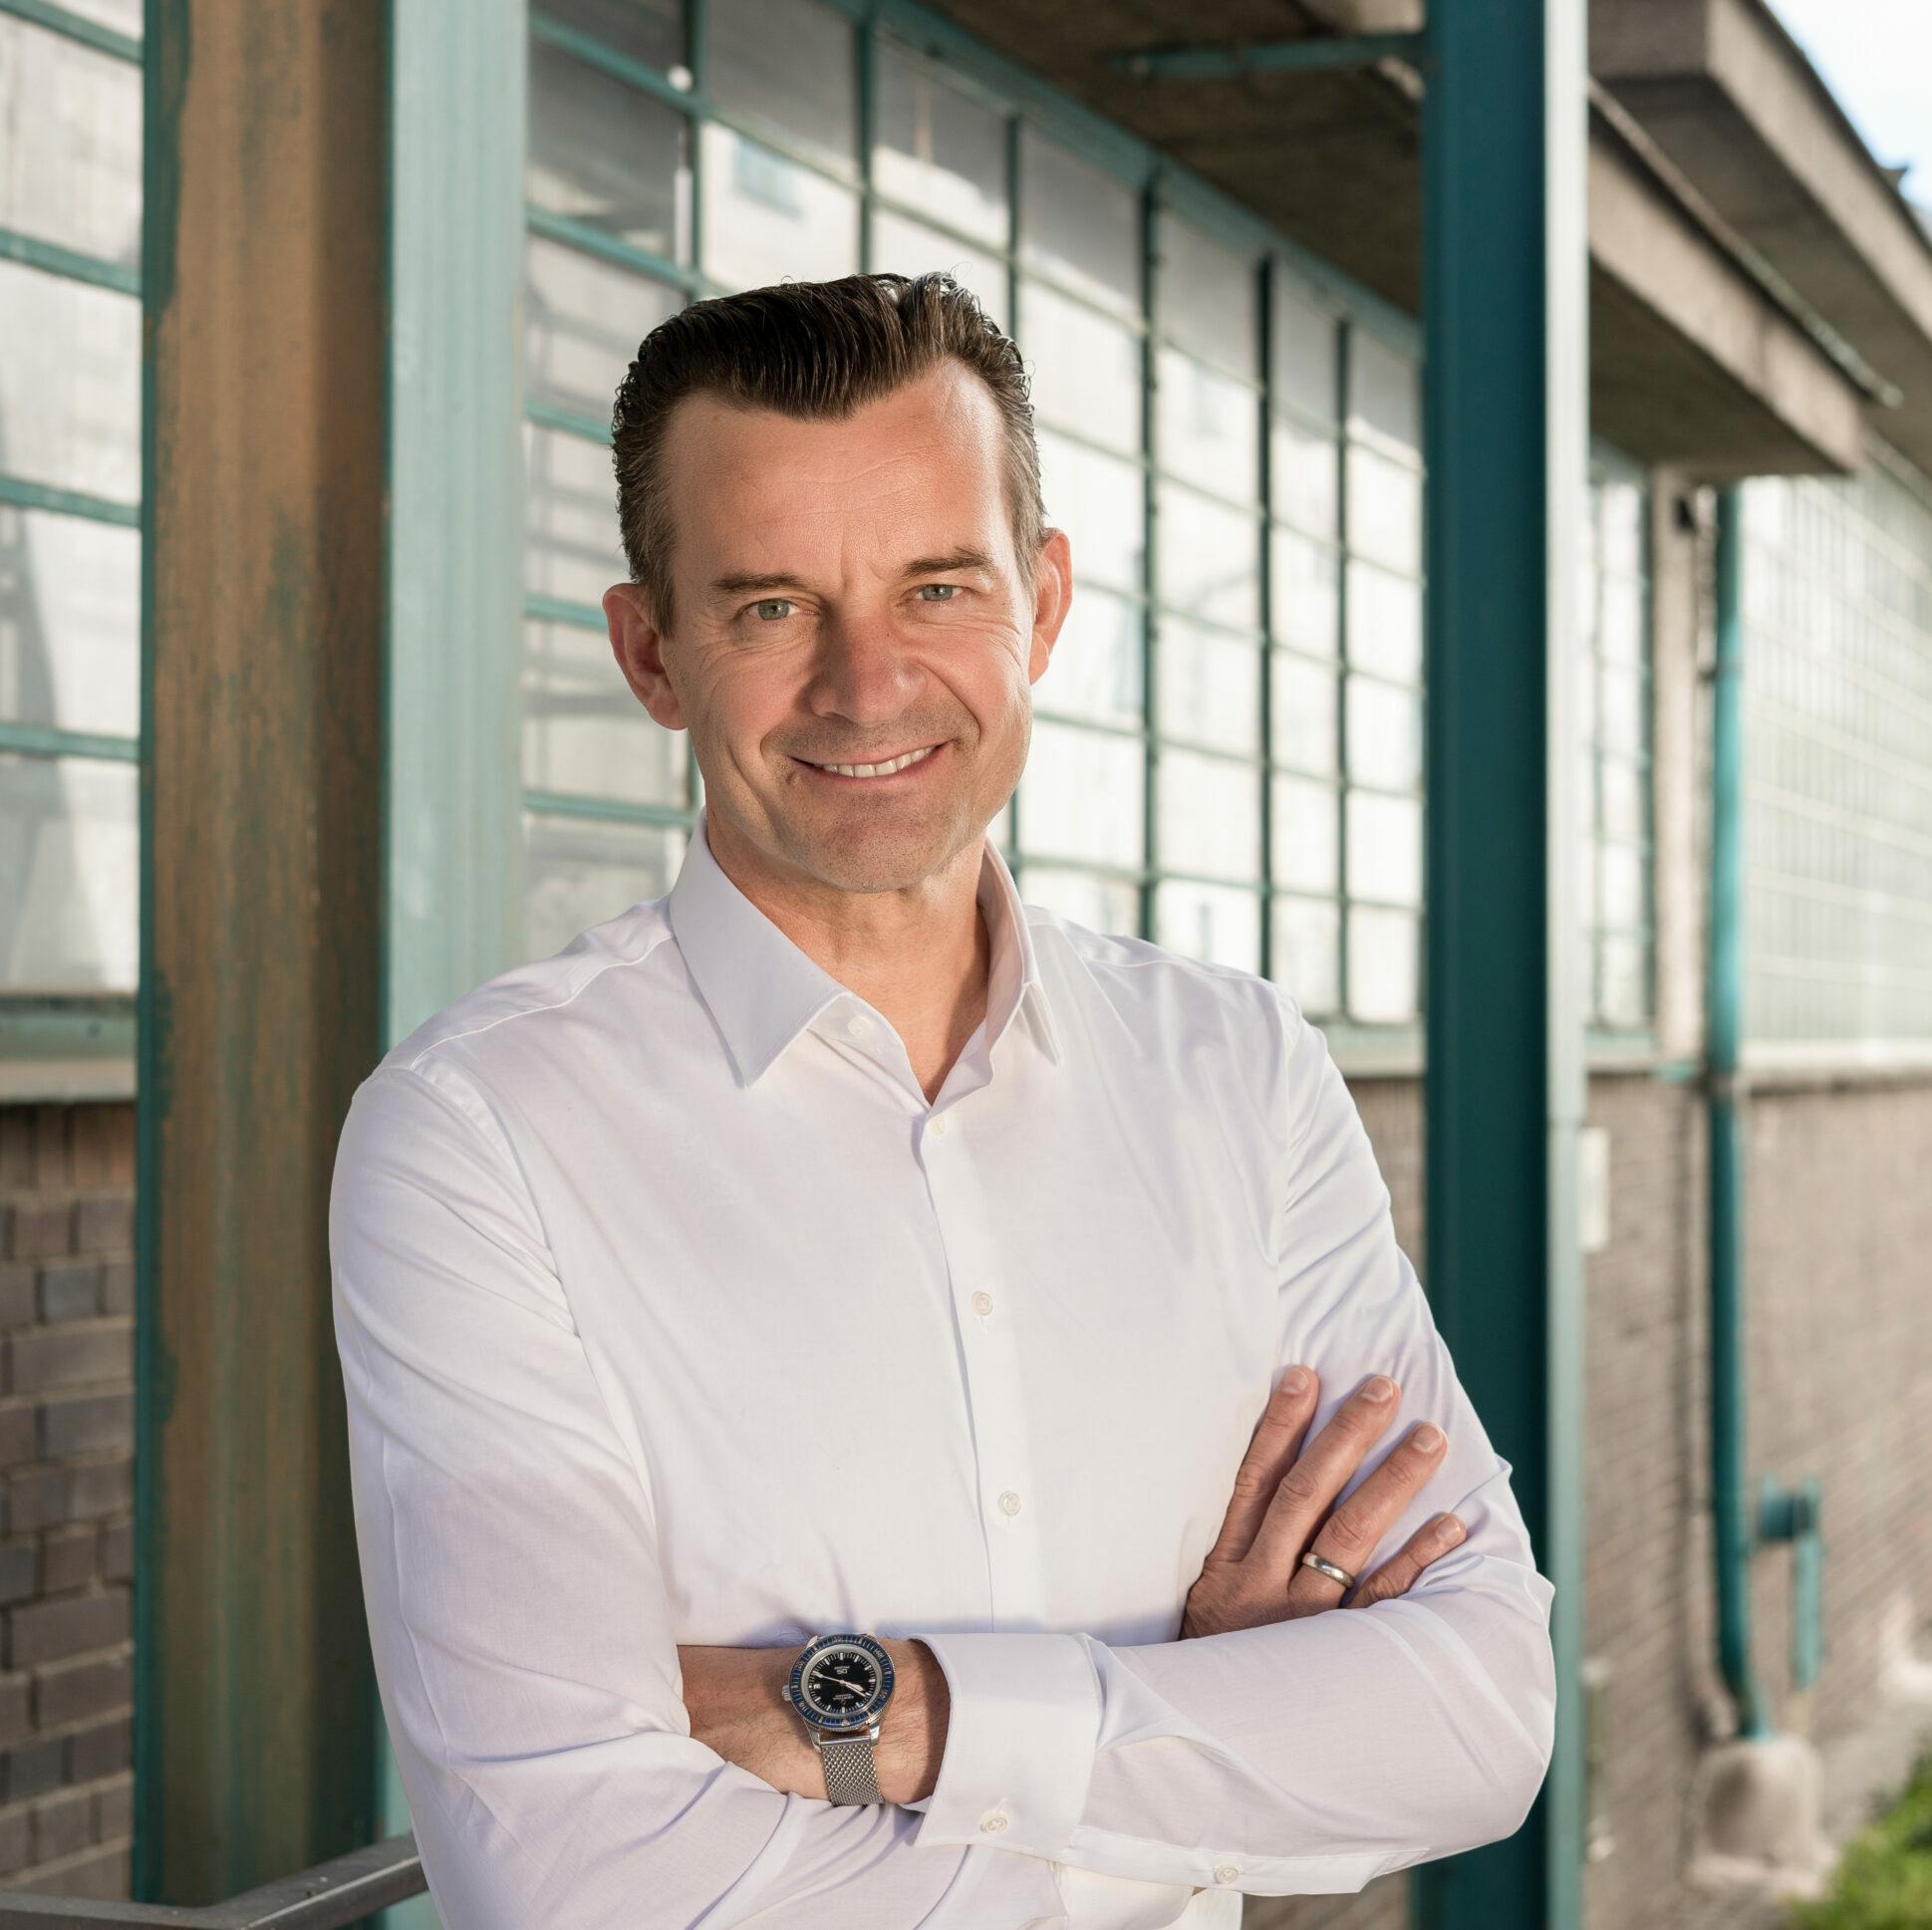 Gerhard Kürner CEO & Founder 506.ai